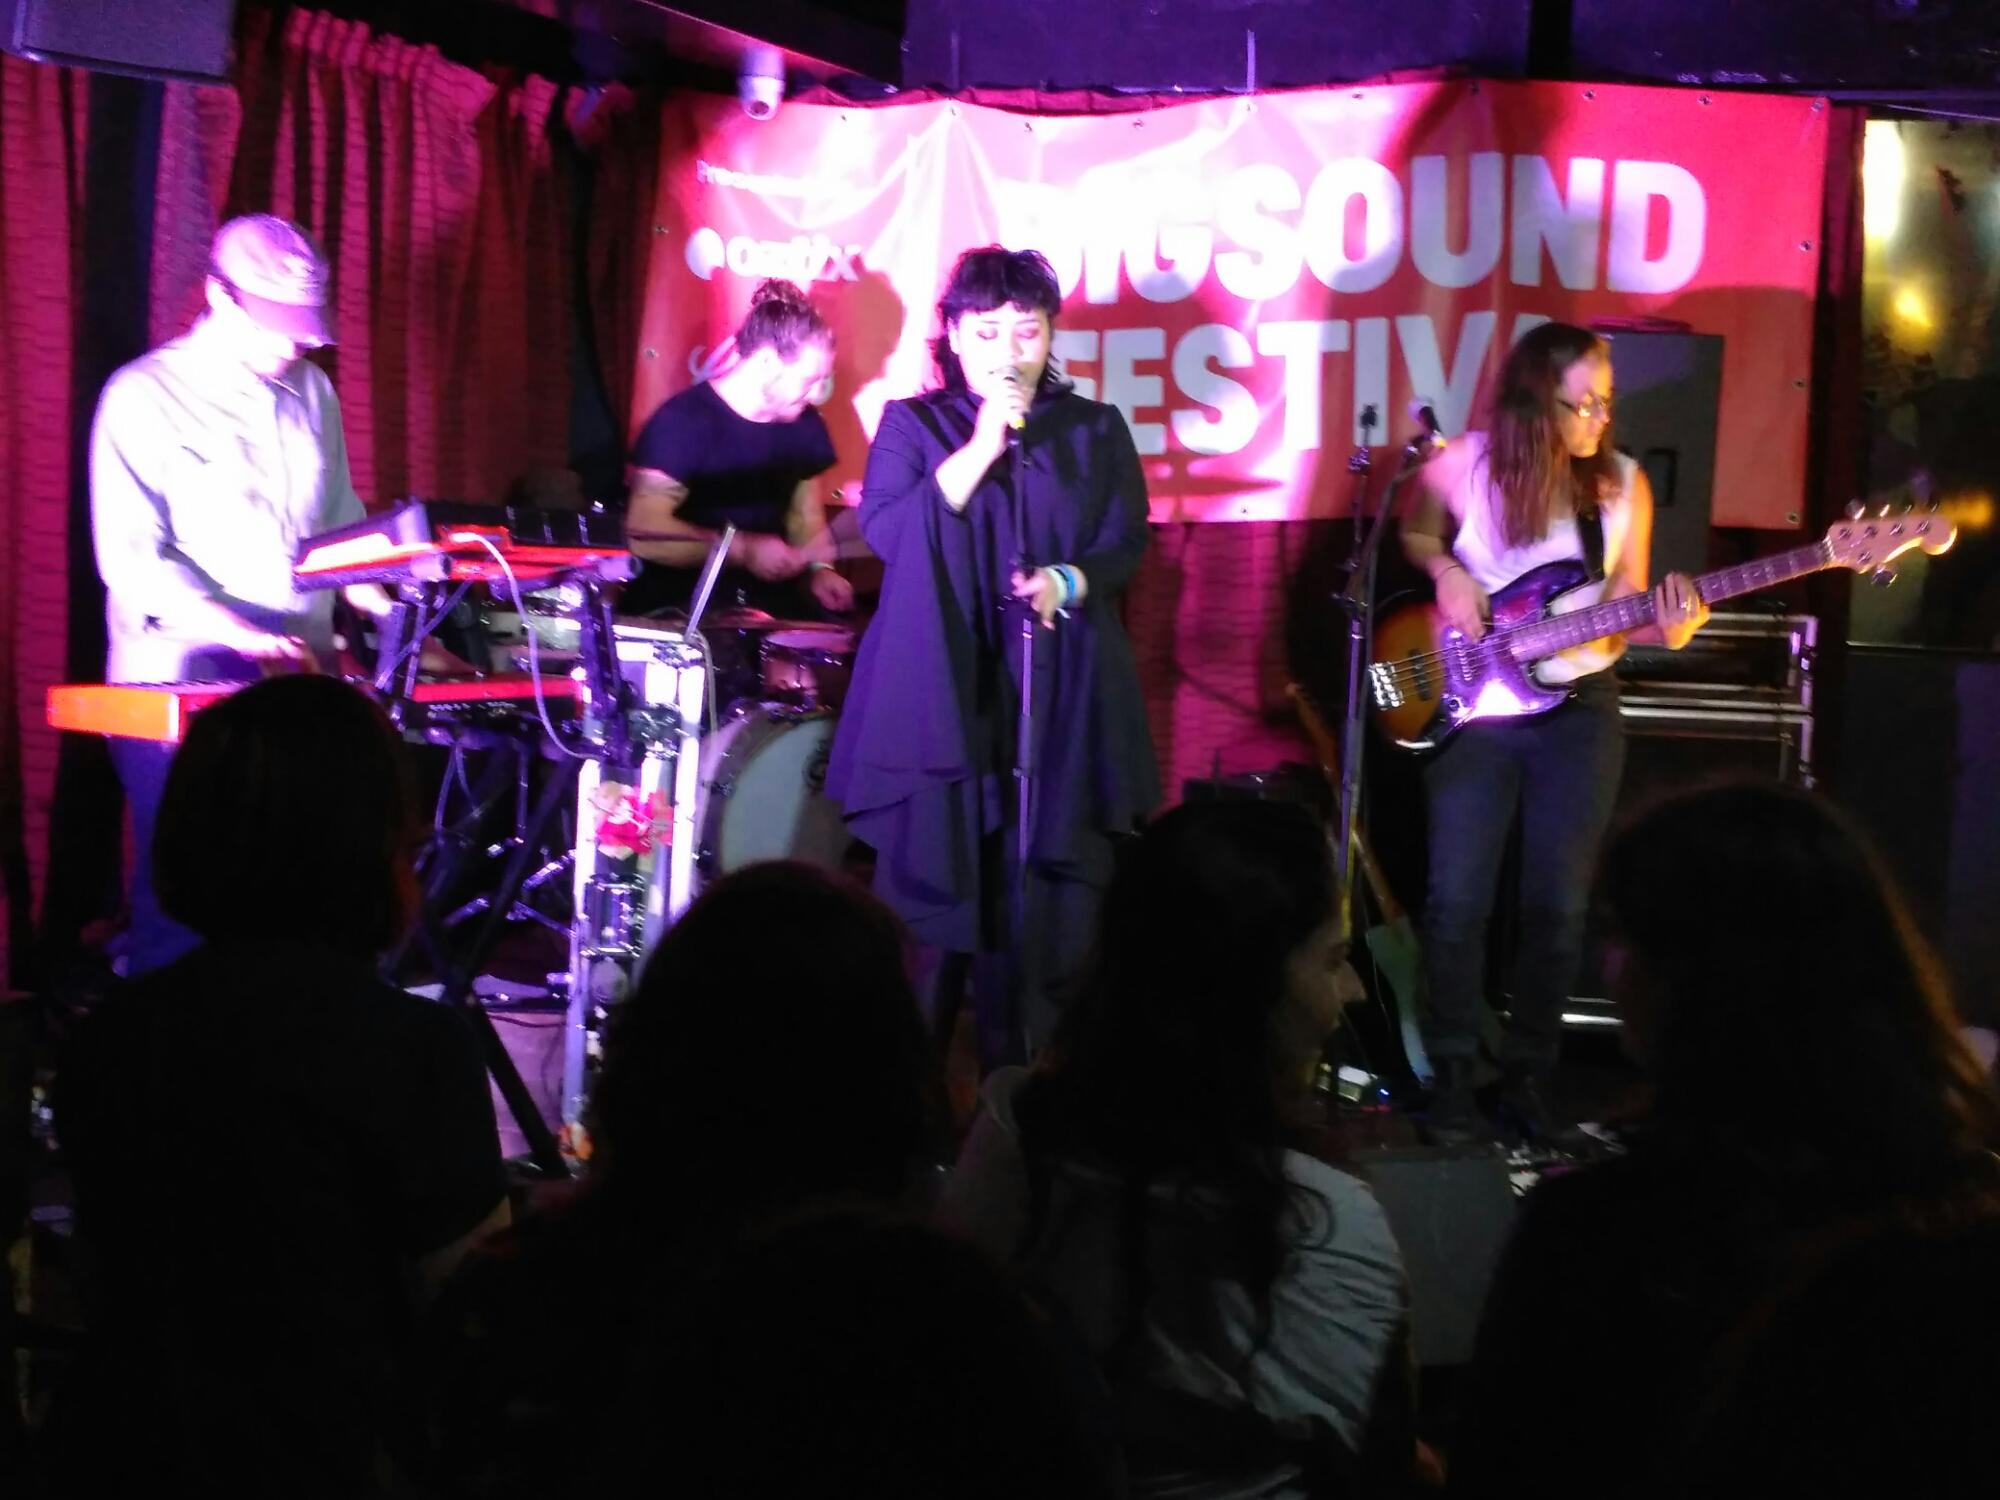 Kira Puru and her three bandmates